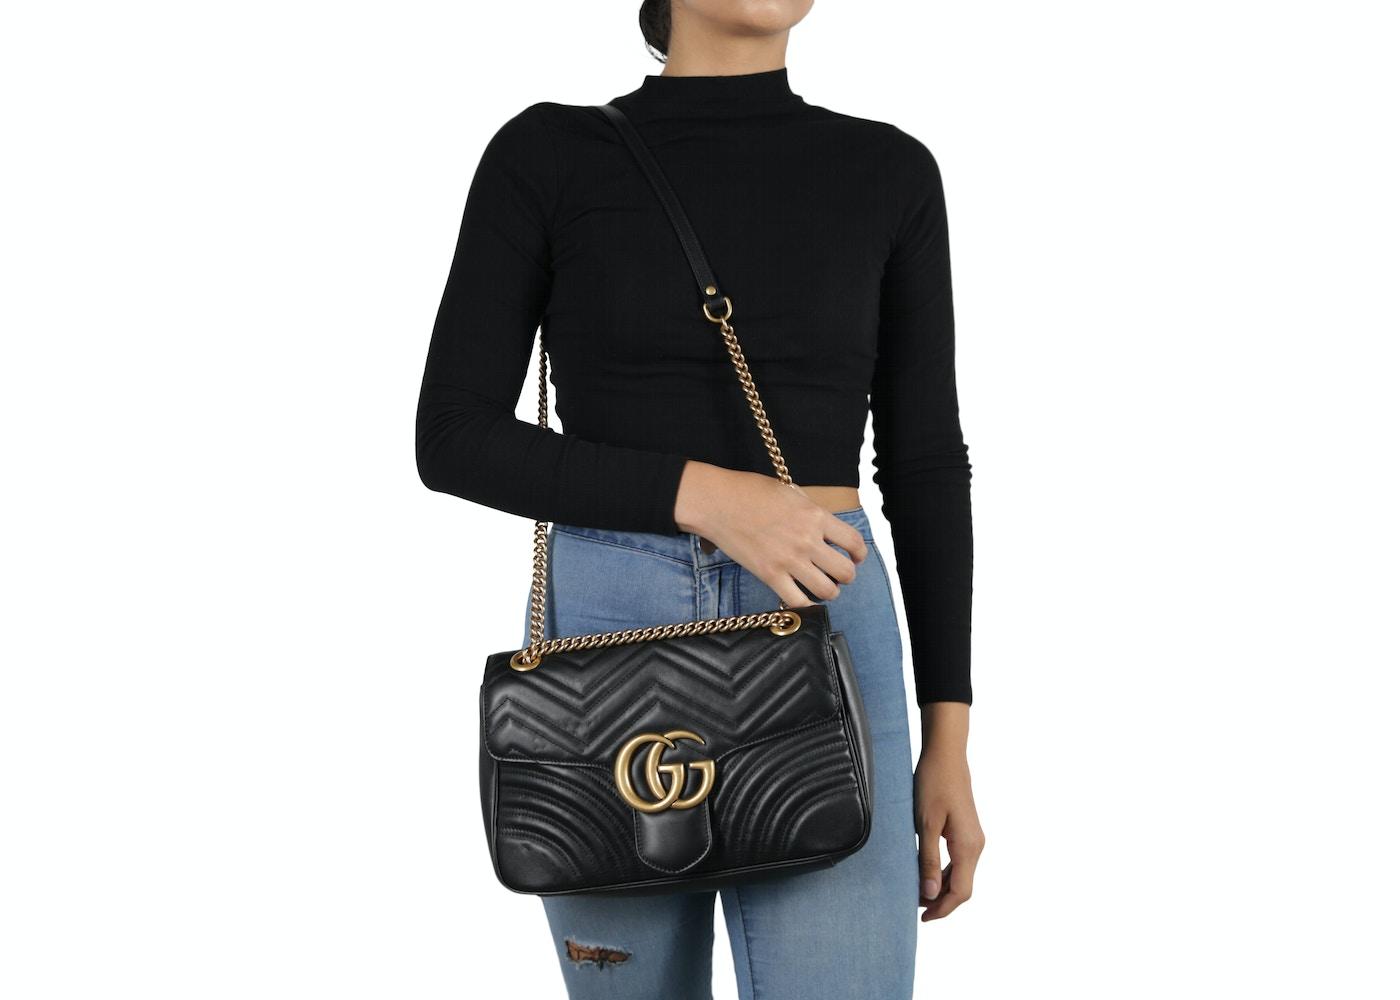 Lyst - Gucci Gg Marmont Matelassé Small Shoulder Bag In